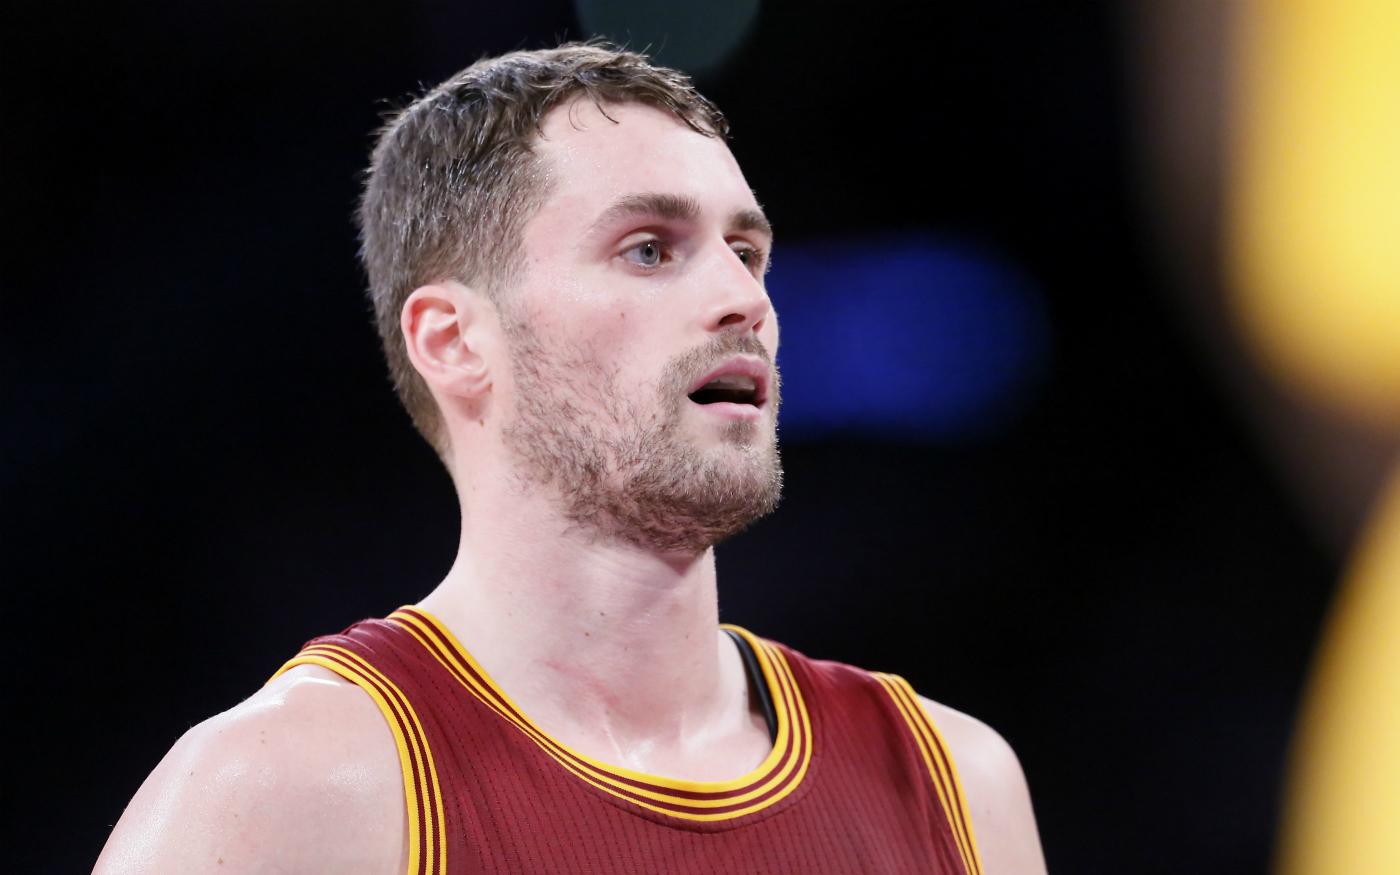 Kevin Love raconte une anecdote sympa sur Kobe Bryant